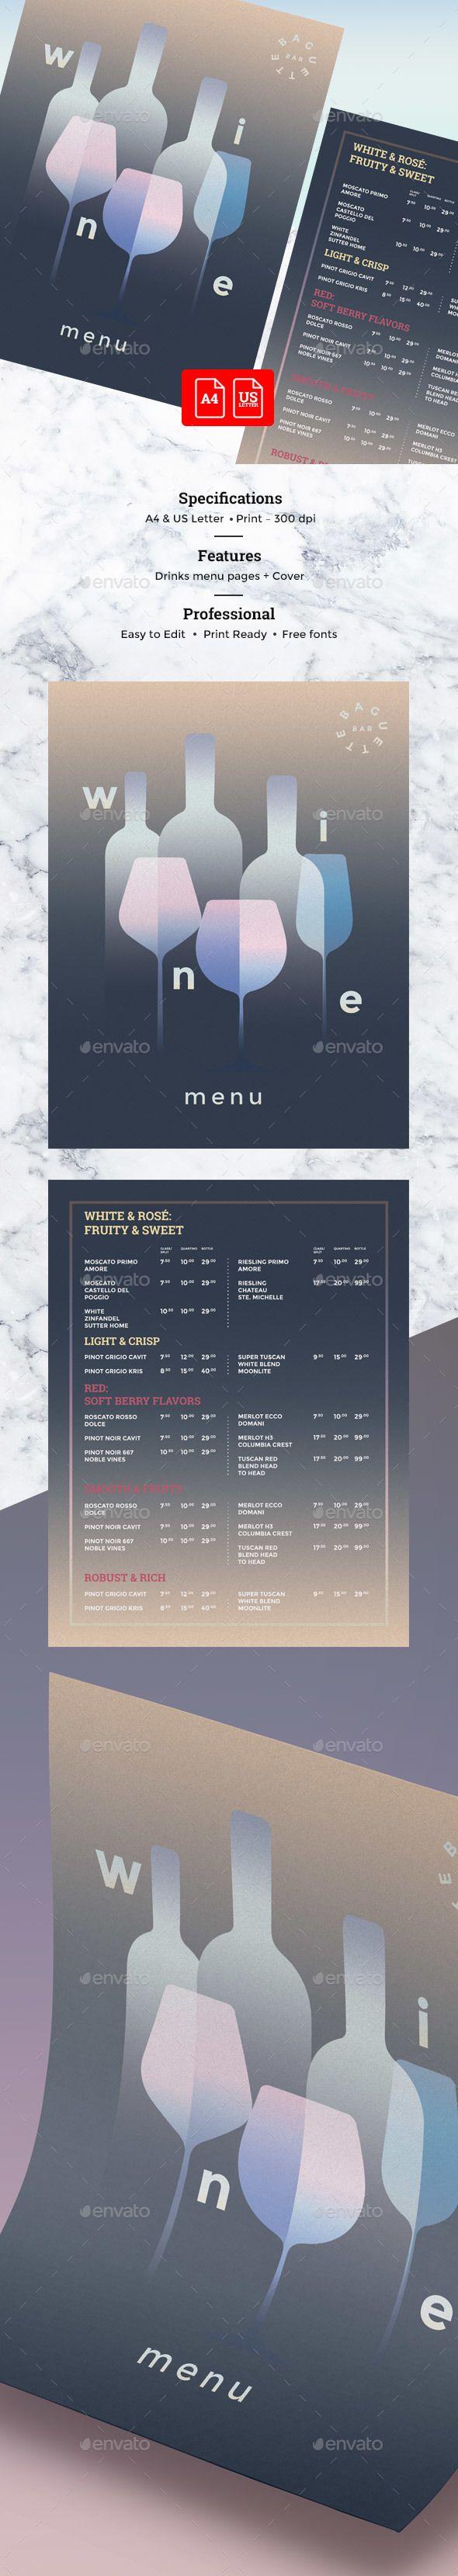 Wine Drinks Menu — Photoshop PSD #drinks menu #club • Available here → https://graphicriver.net/item/wine-drinks-menu/19807481?ref=pxcr